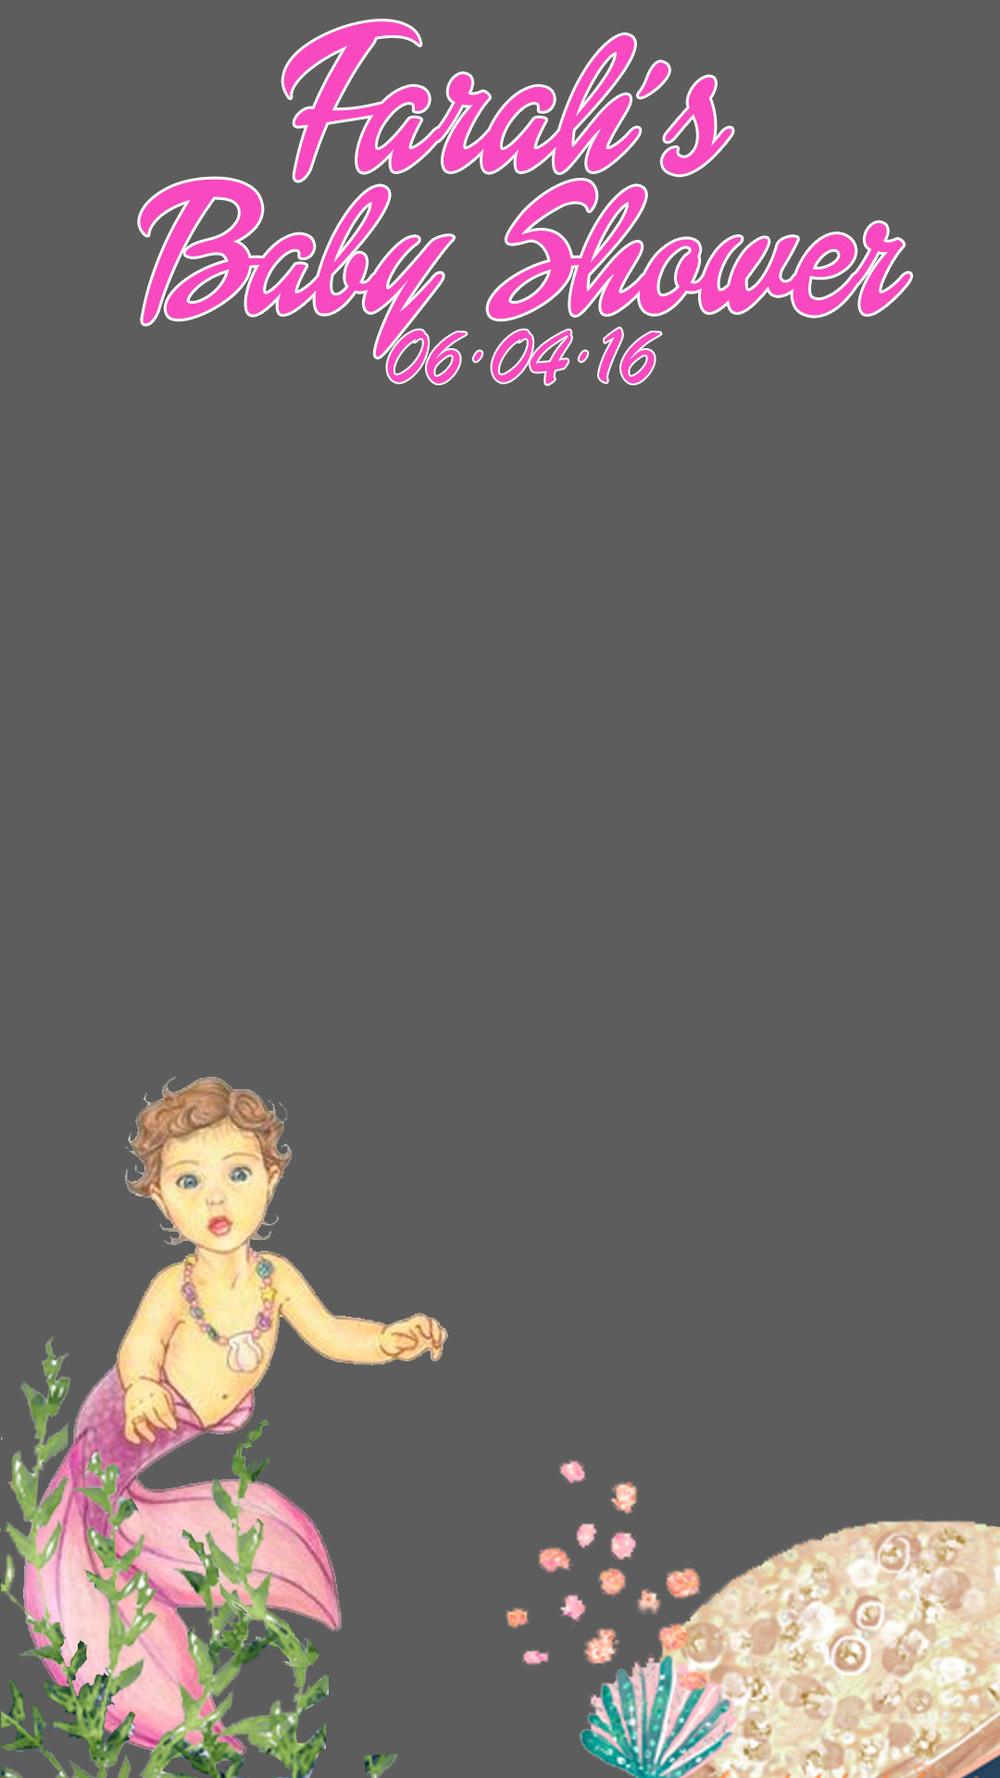 Farahs baby shower.jpg